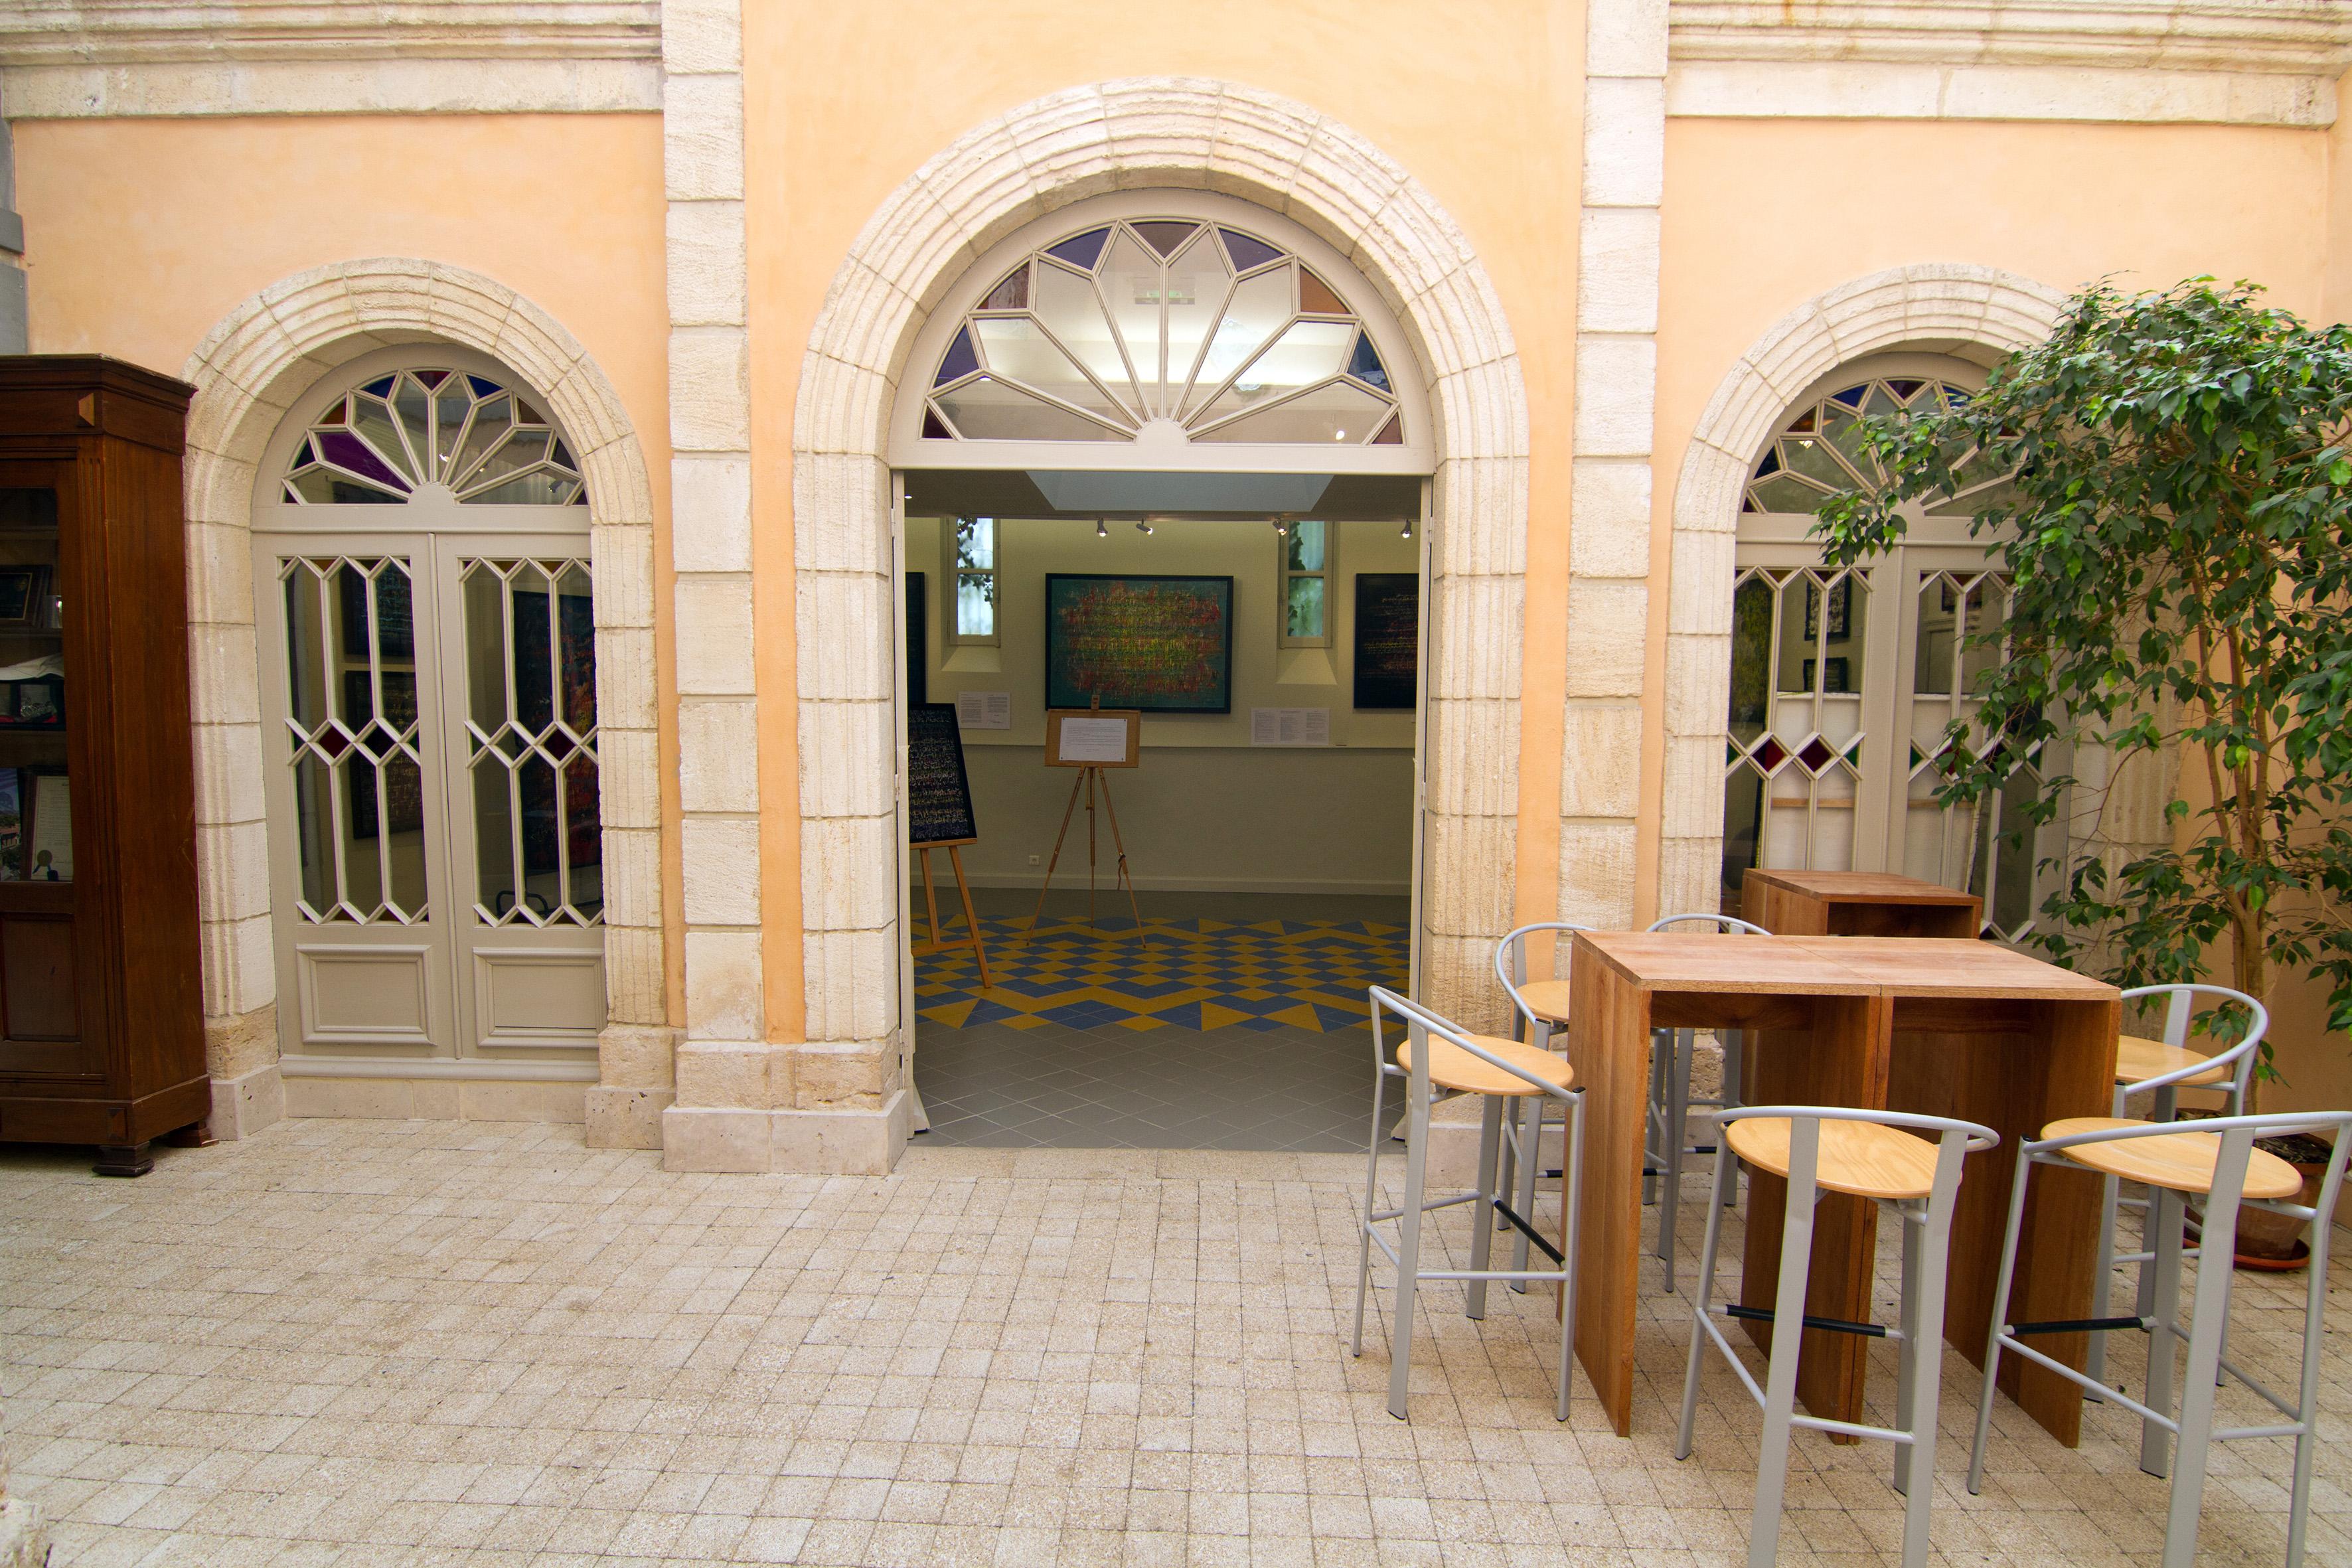 Galerie d'Art l'Arcade Saint-Clar_Jean-Claude Bertrand-5918-170707